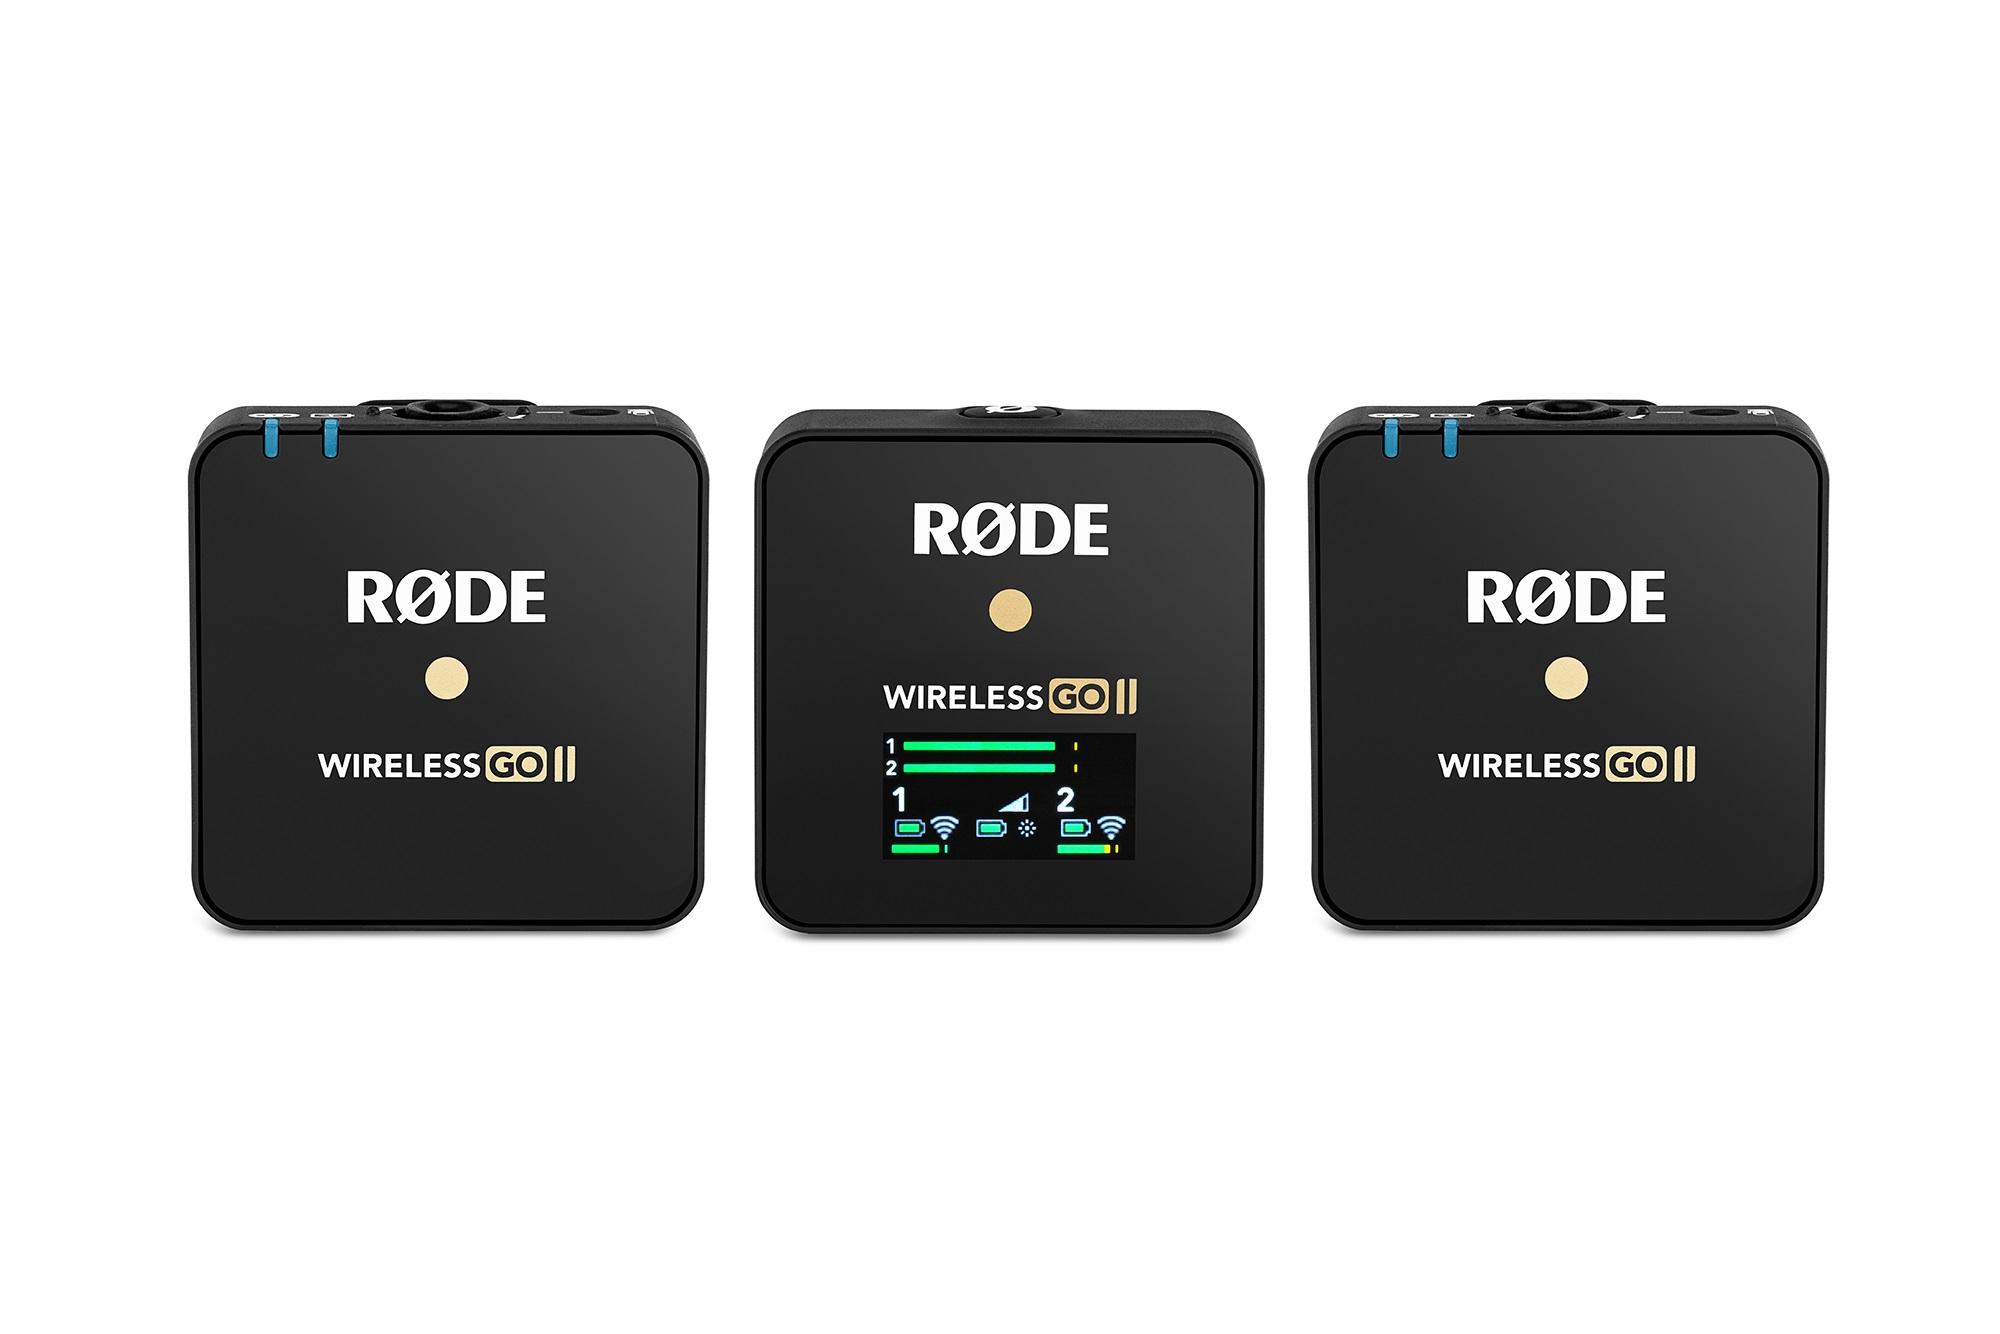 Rode Wireless GO II digitales 2-Kanal Drahtlos Mikrofonsystem 111187